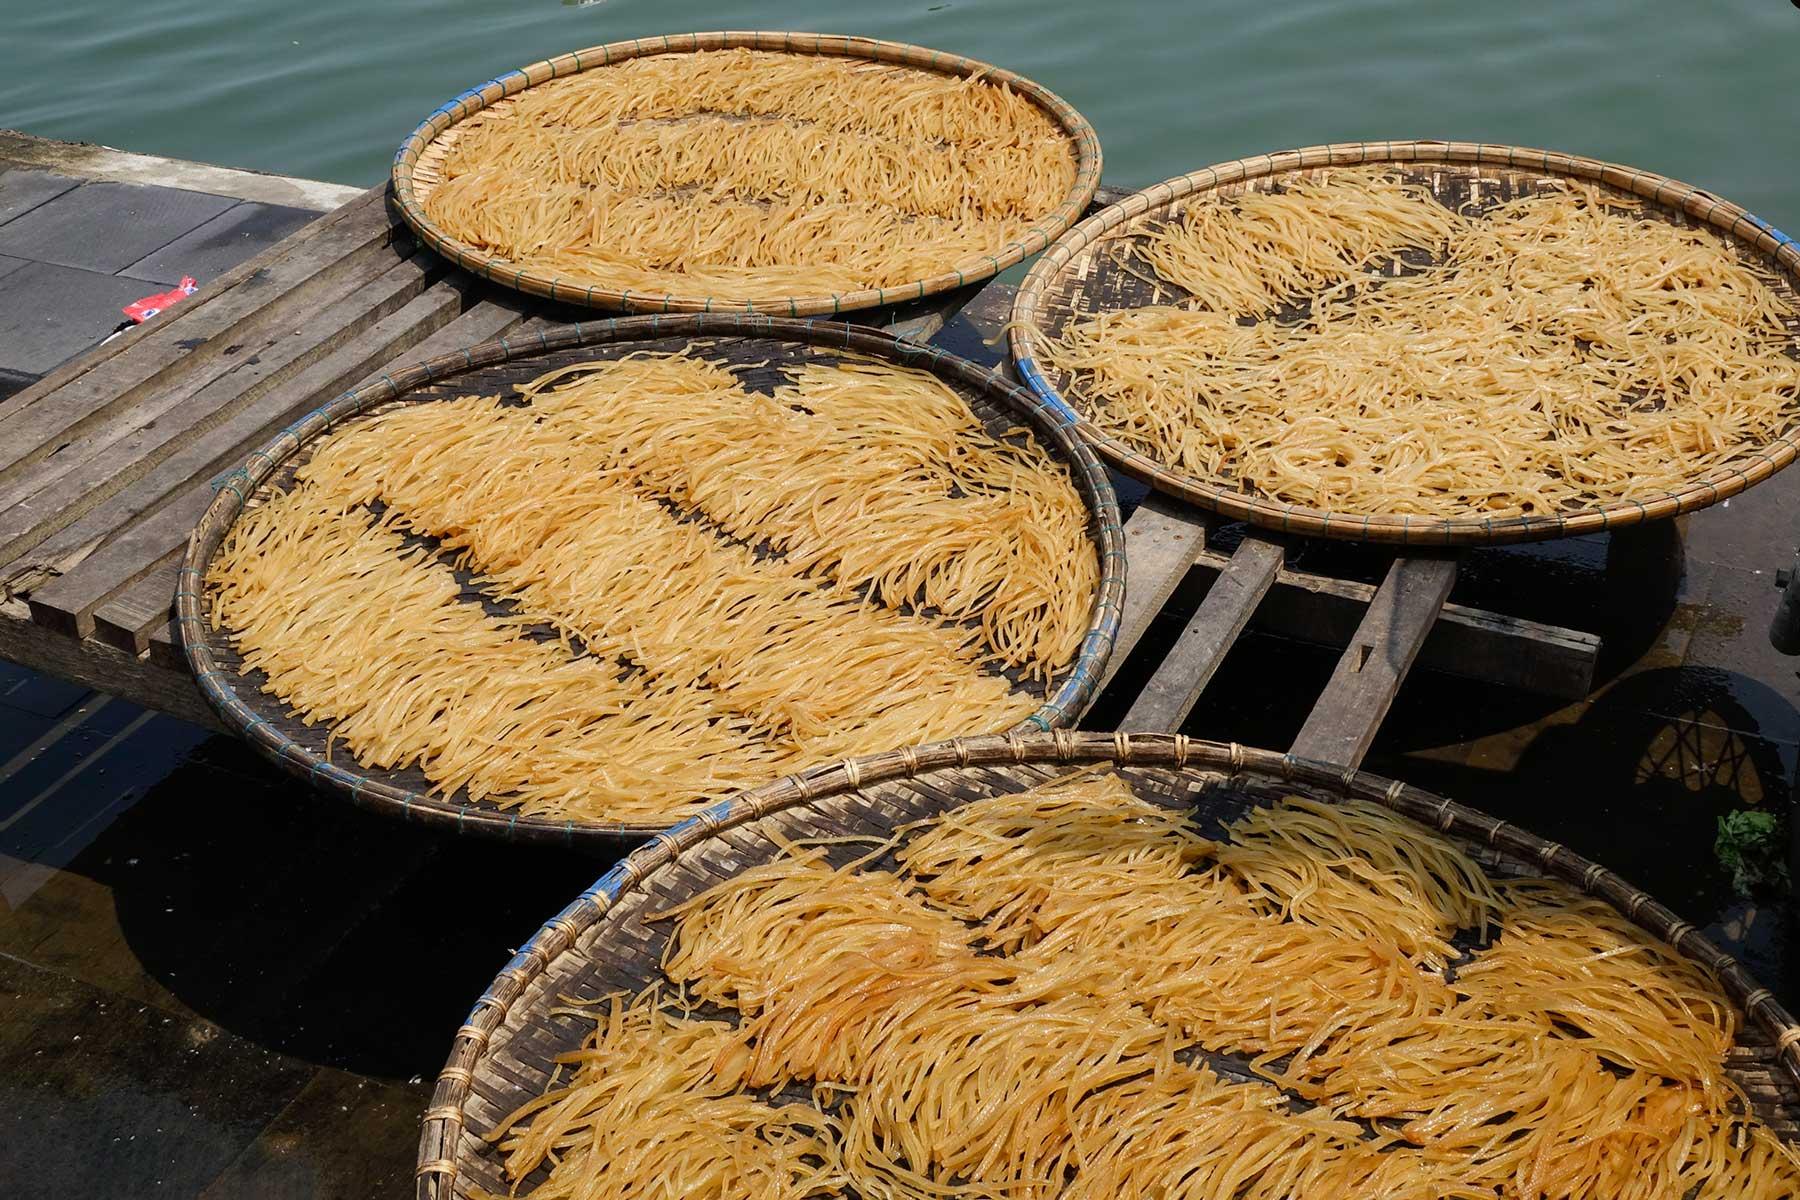 Cao Lau Noodles from Hoi An